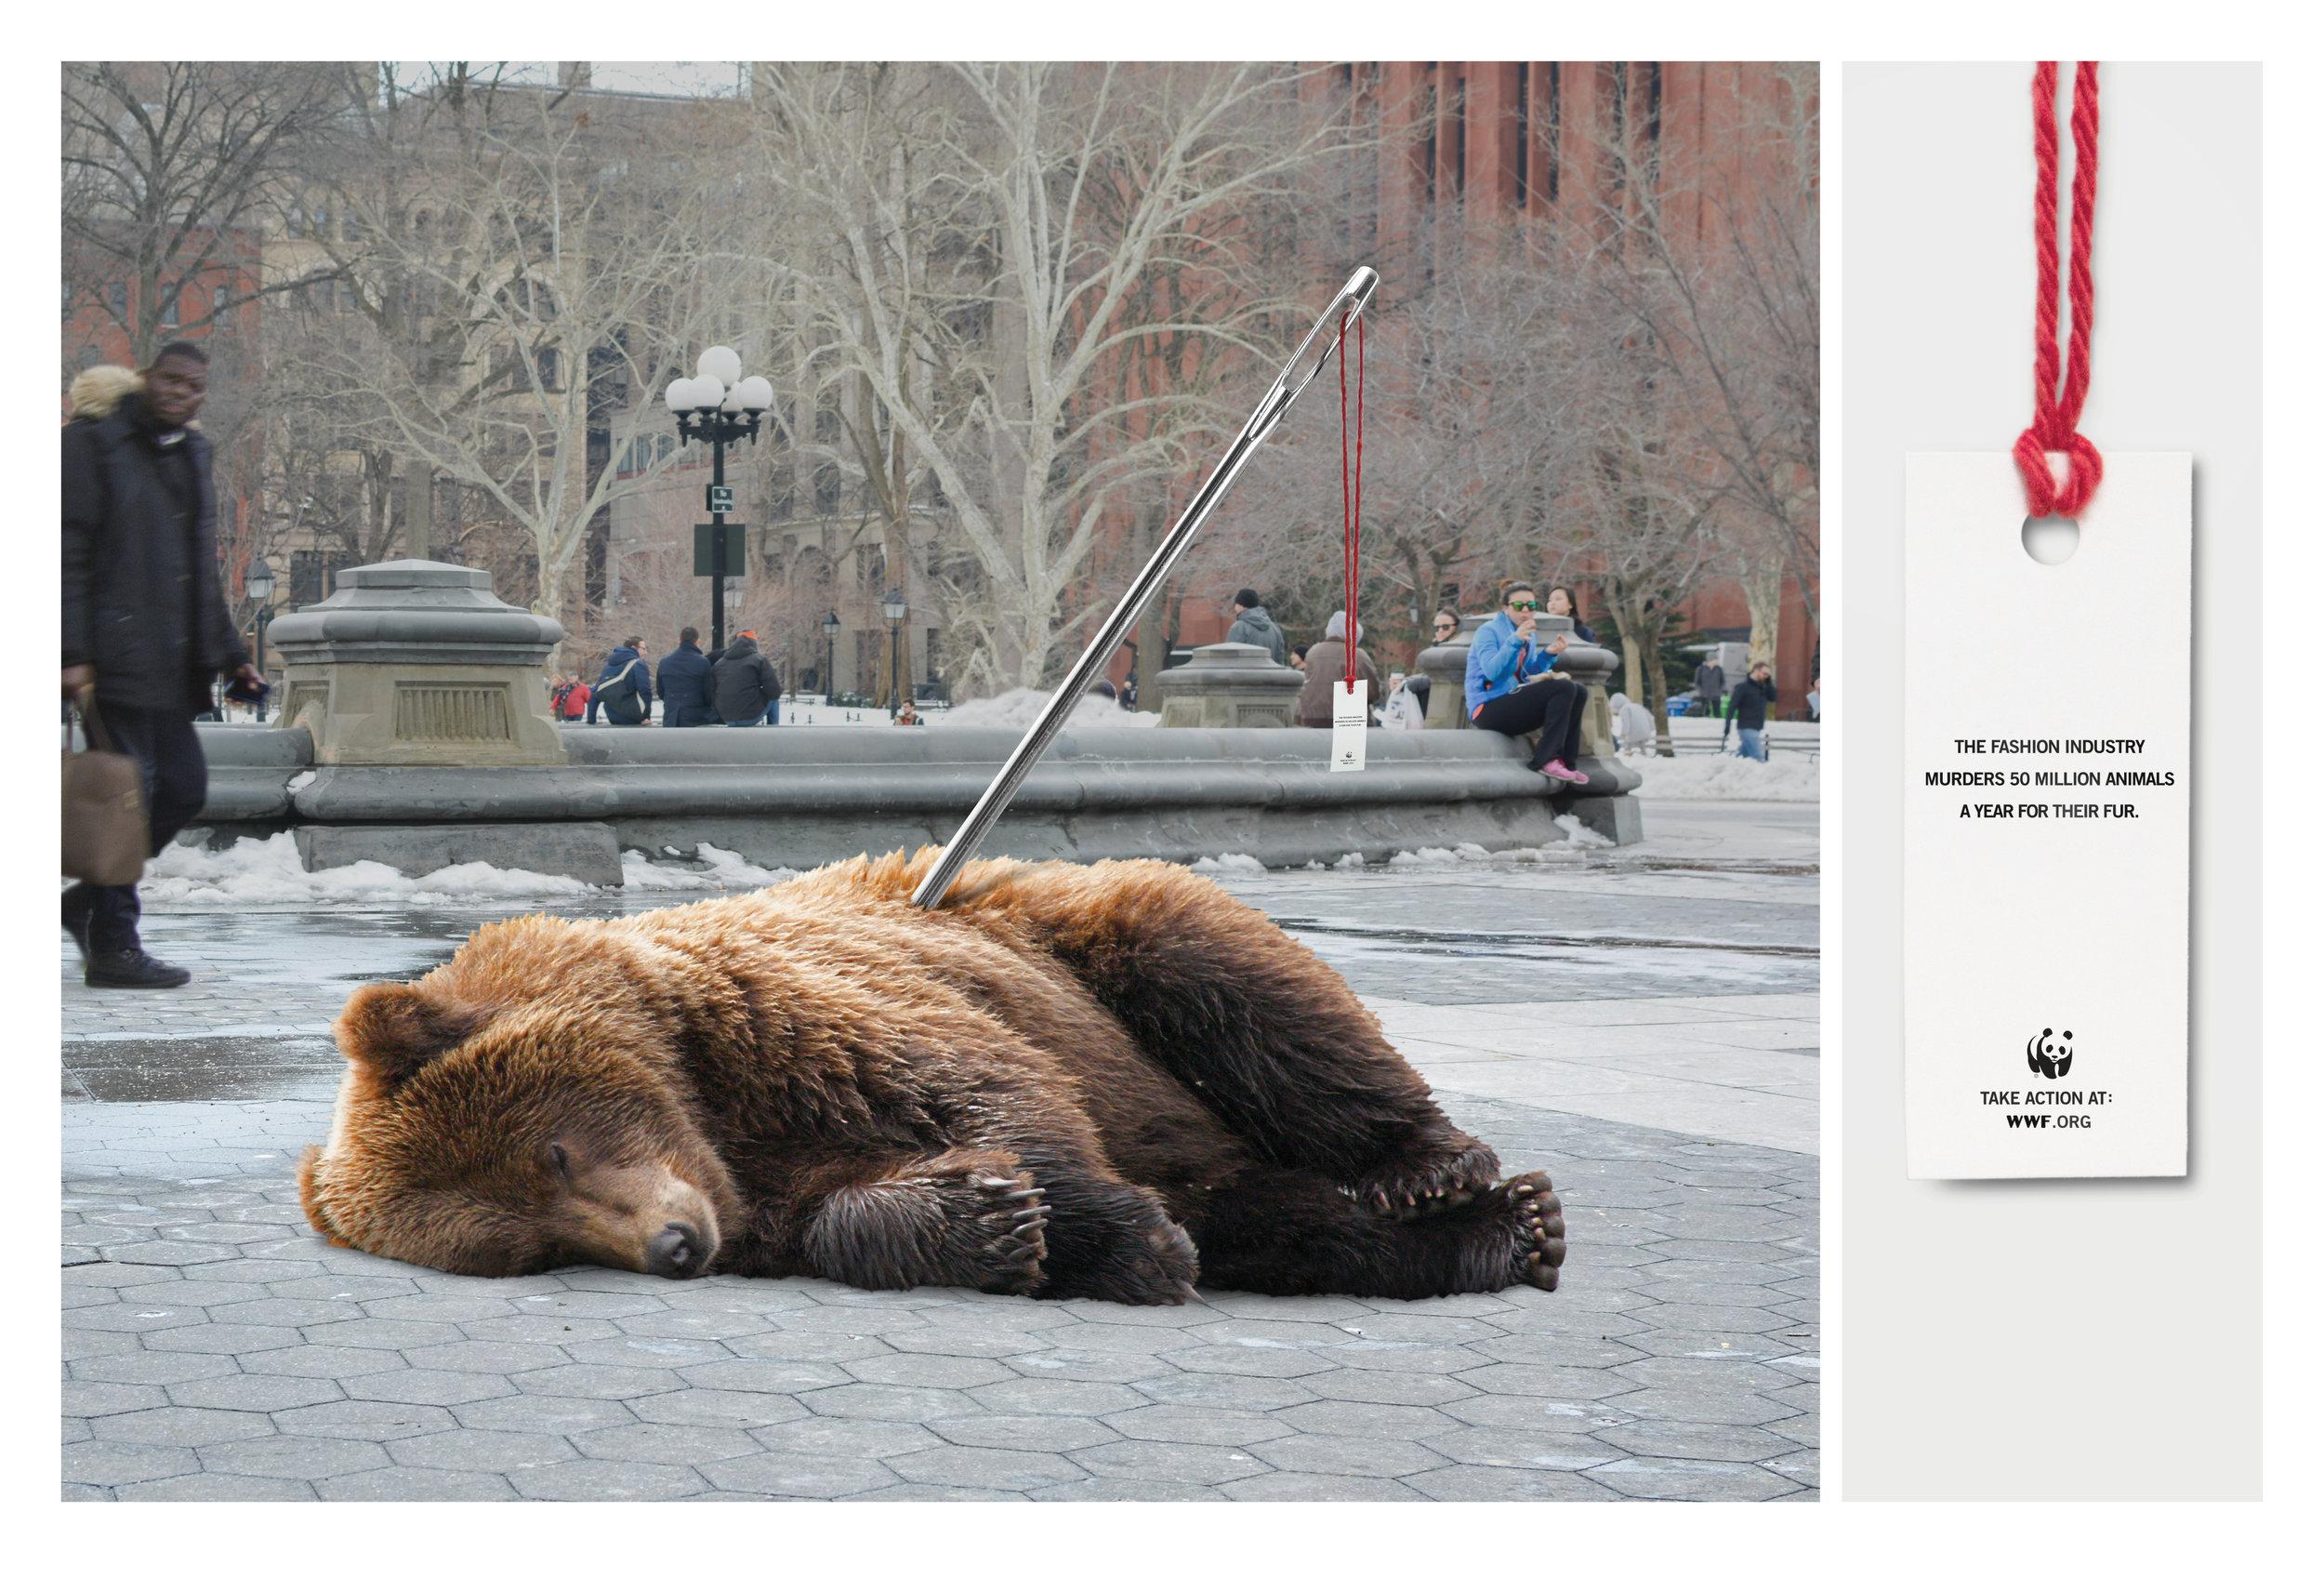 WWF_Sewing Needle2.jpg